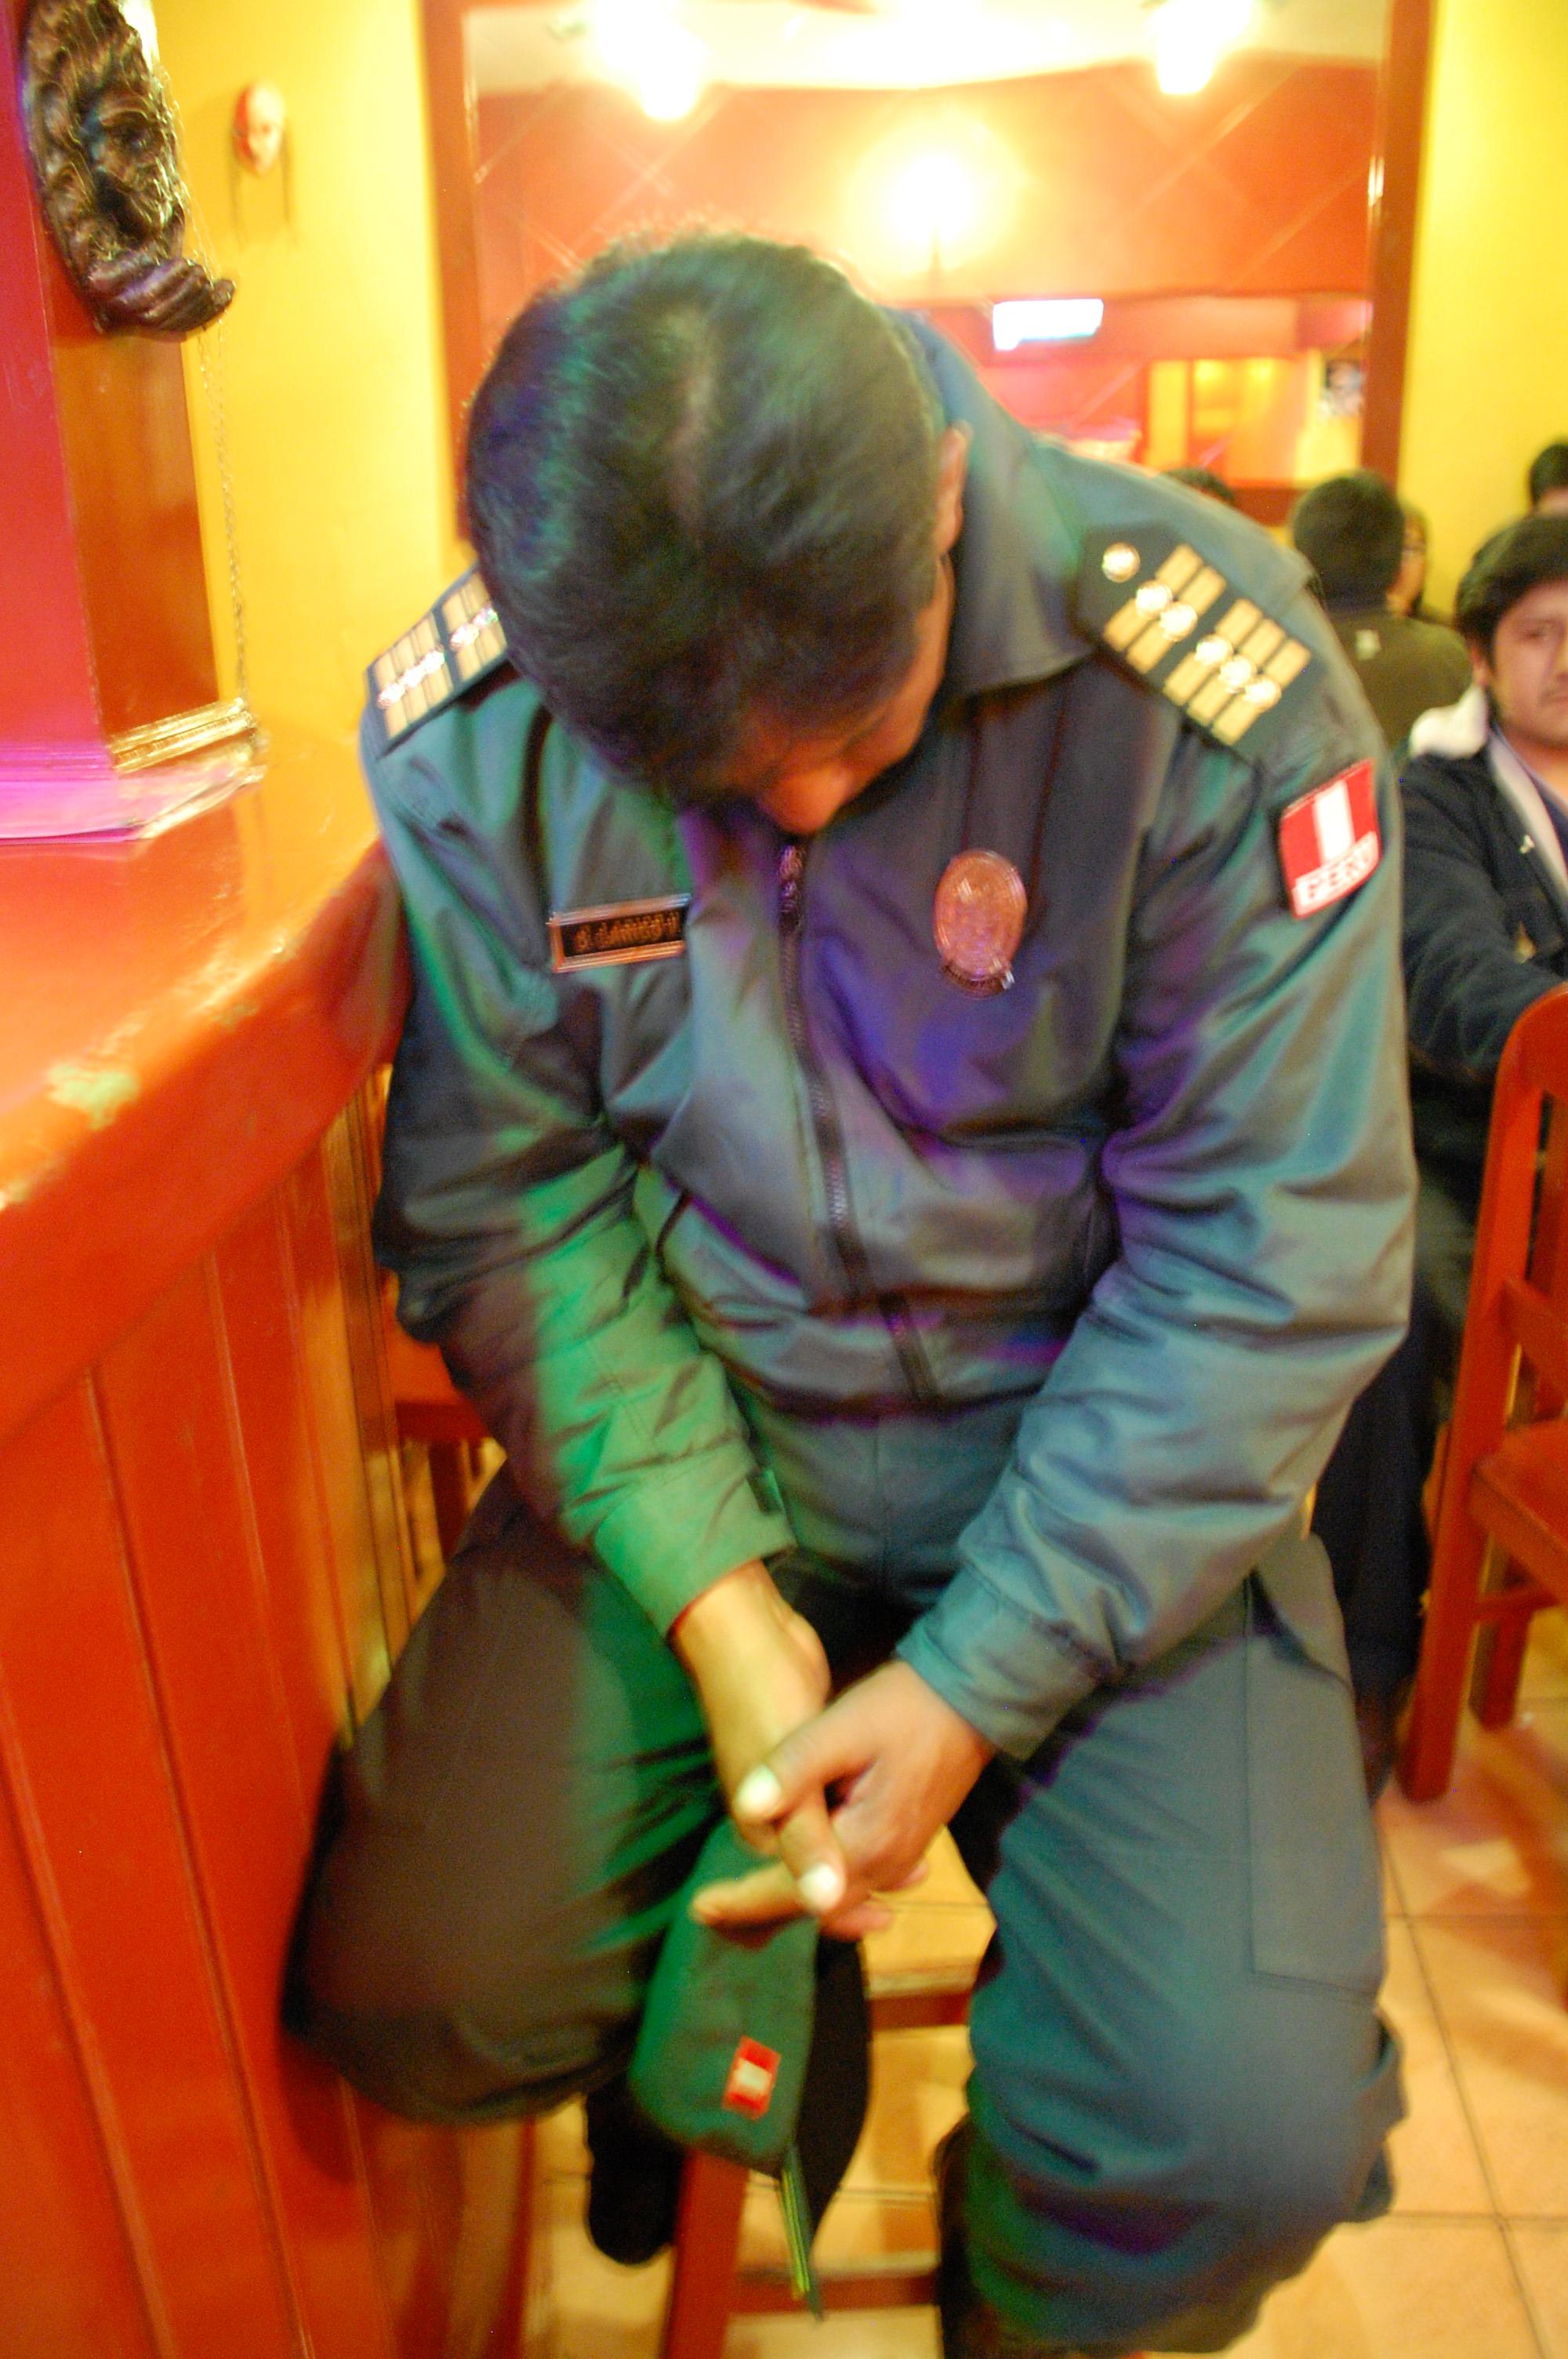 Peruvian police rest-up